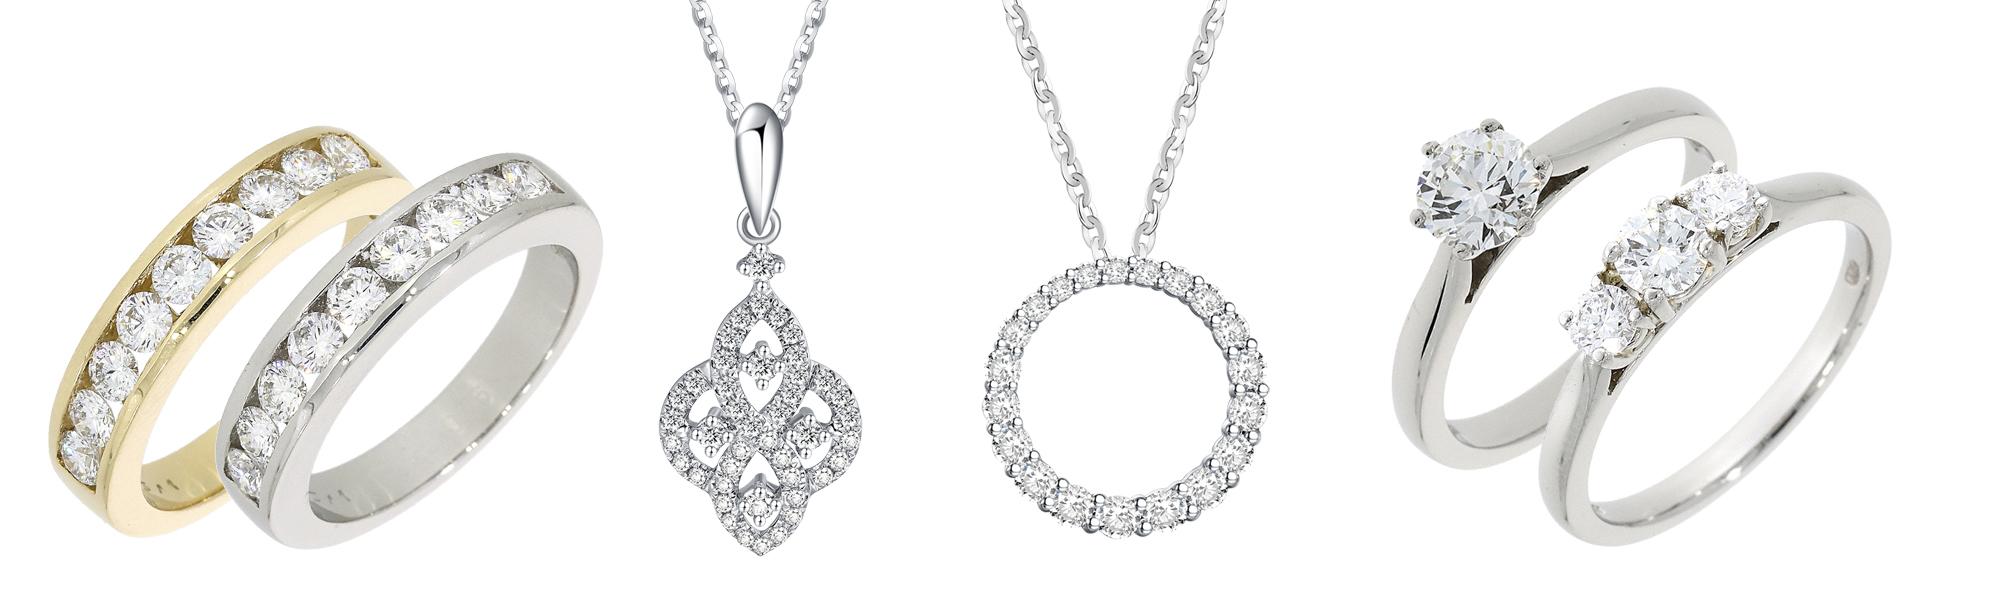 Diamonds Sally Thornton Jewellery blog at Thorntons Jewellers Kettering Northampton